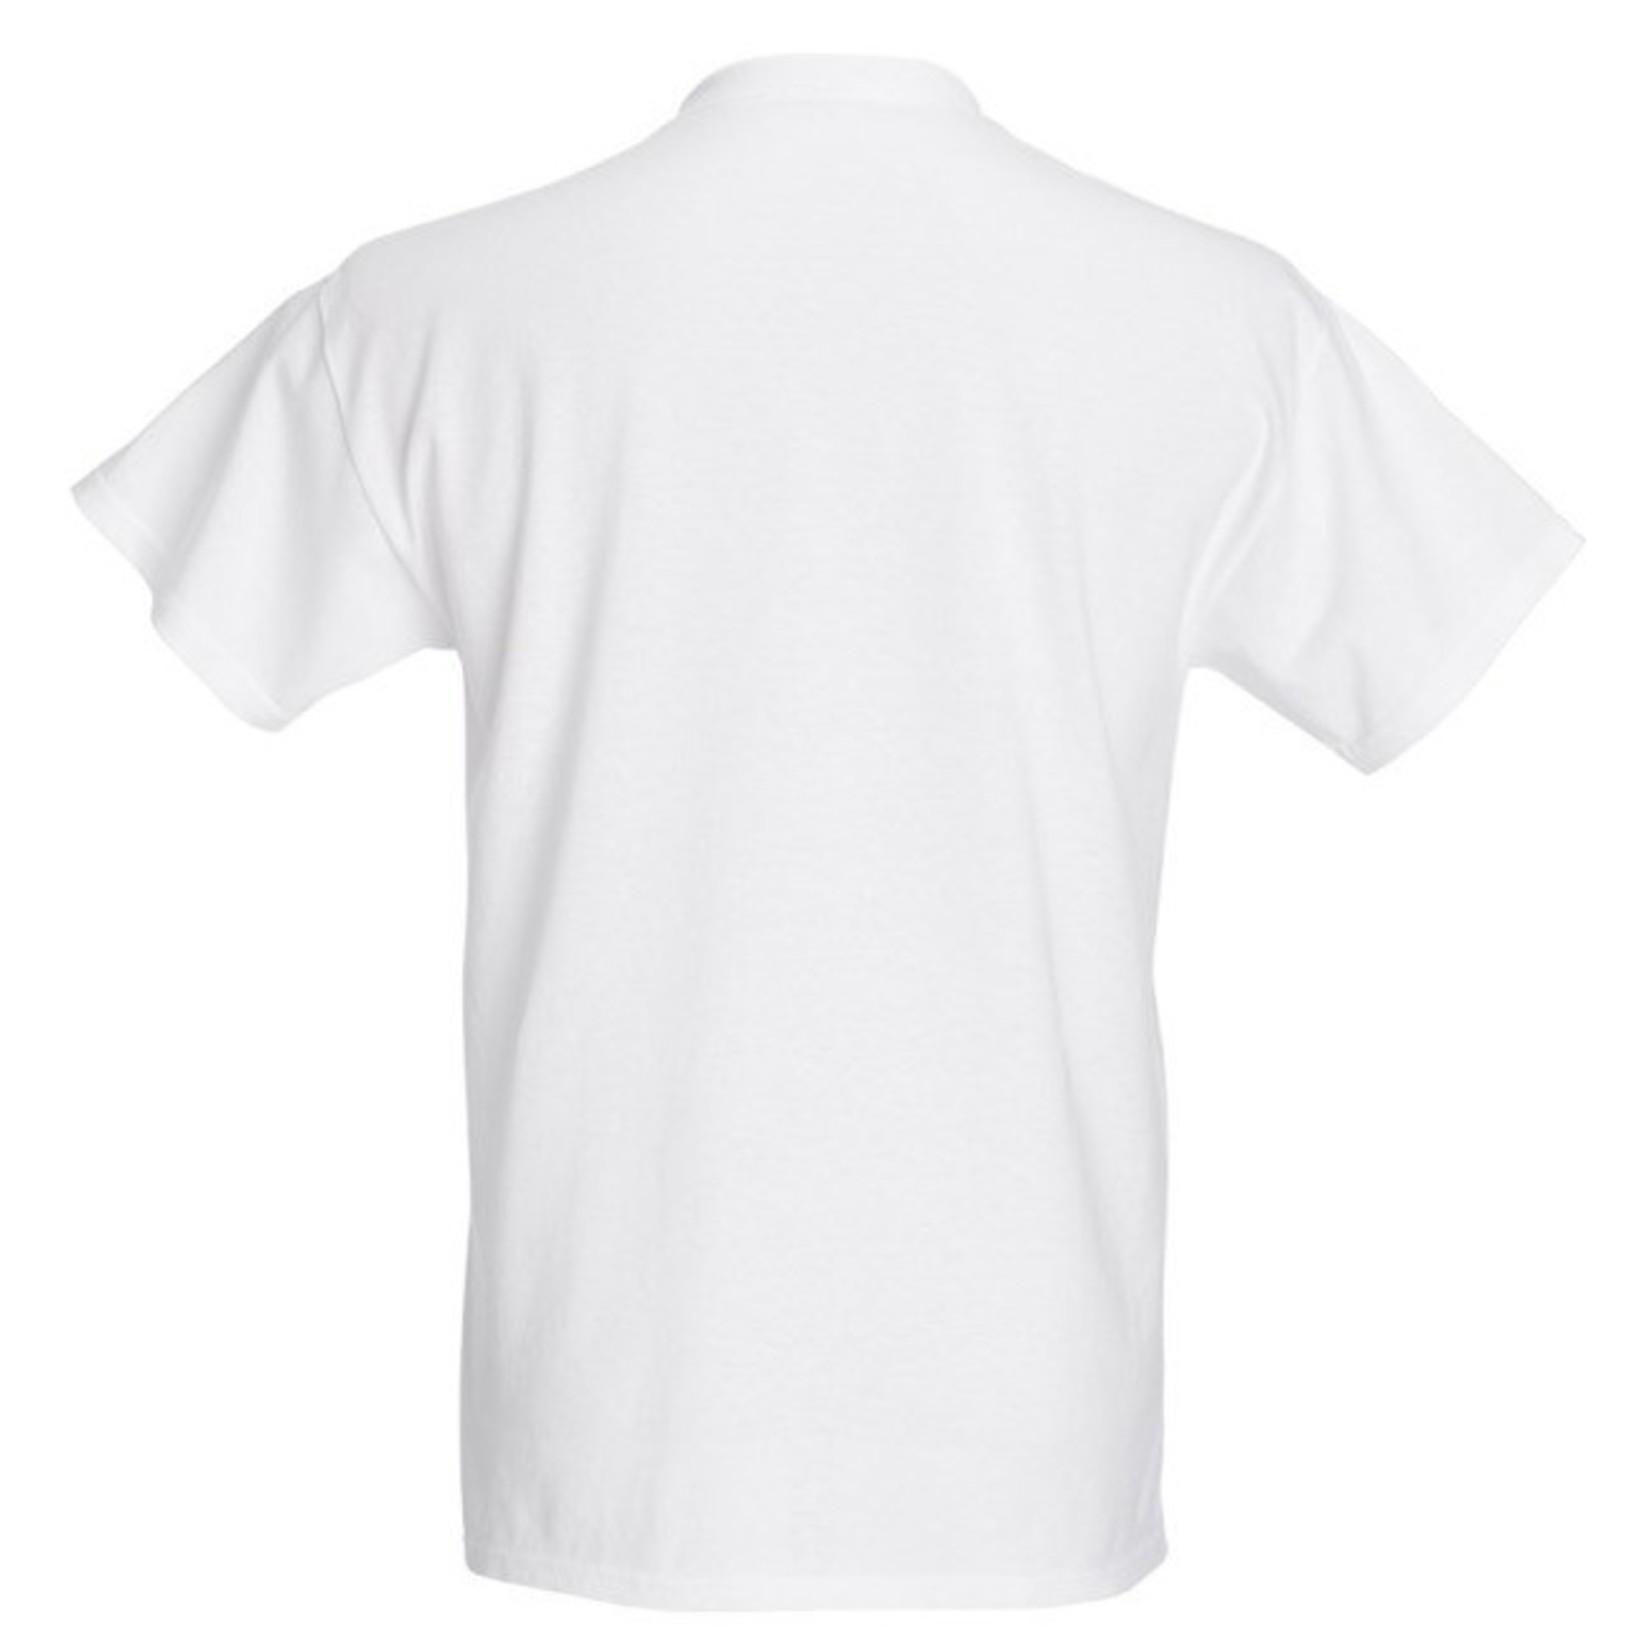 Bad Annie's T-Shirt - Love Thy Neighbor